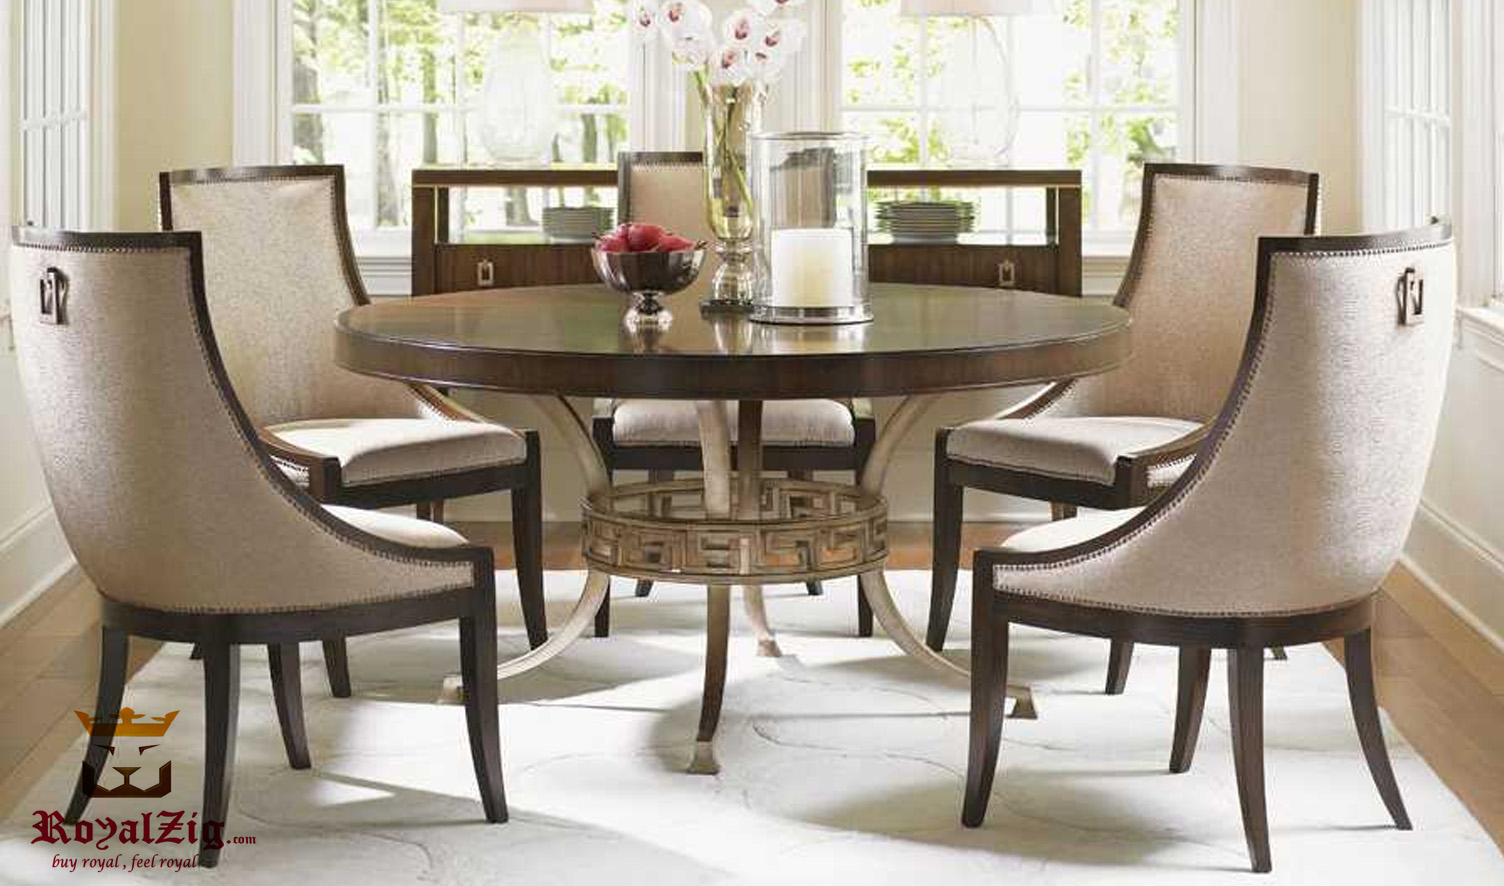 California Mid Century Modern Round Dining Table